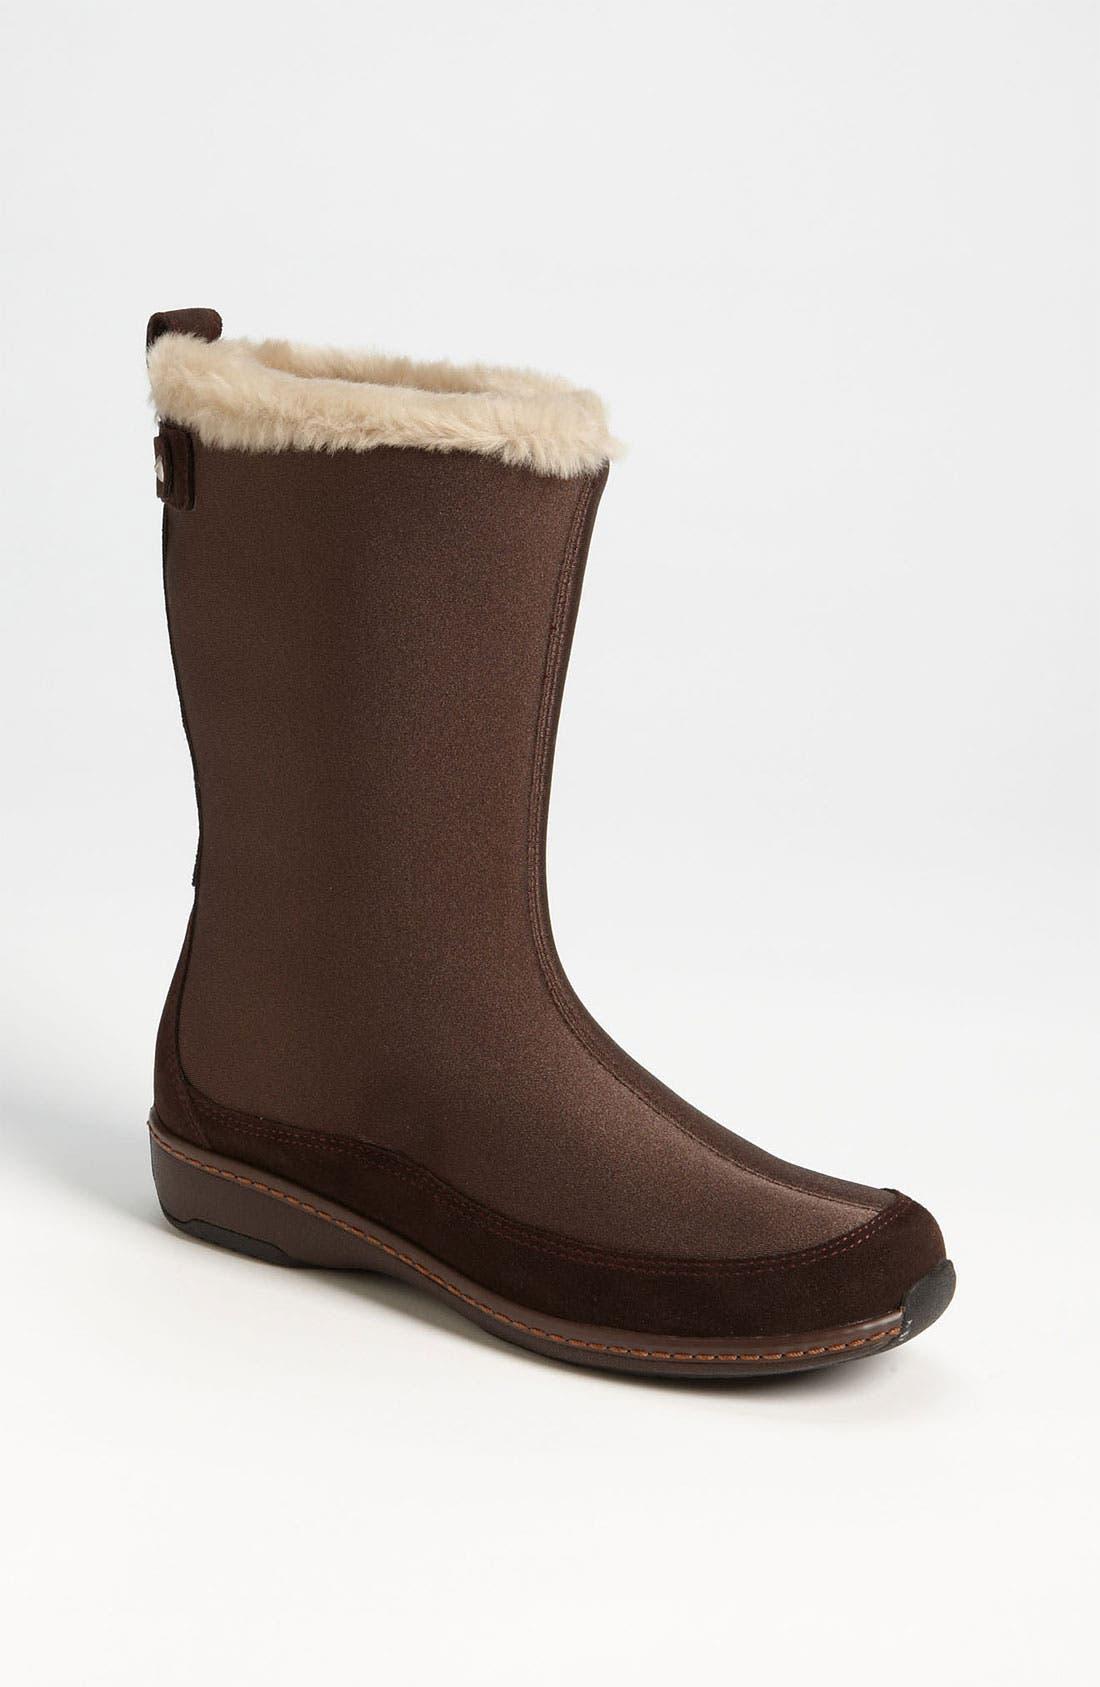 Main Image - Aetrex 'Furry' Mid Calf Boot